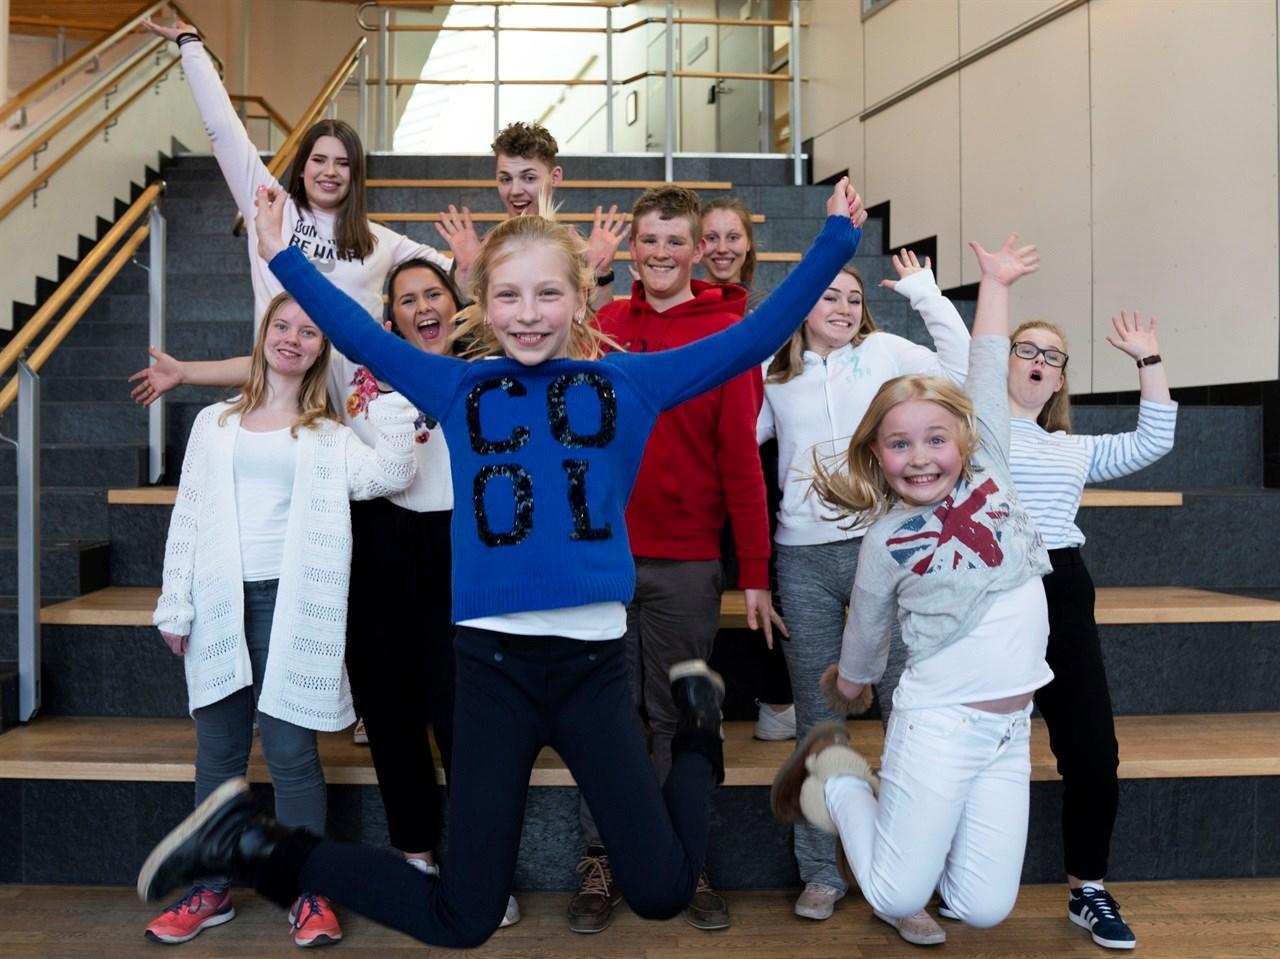 HOPPENDE GLADE! Kom på konsert på Lillestrøm Kultursenter lørdag 27. april kl. 17.00 og 19.00 og hør Skedsmo Voices og Neon Vokals viktige budskap! <br/>